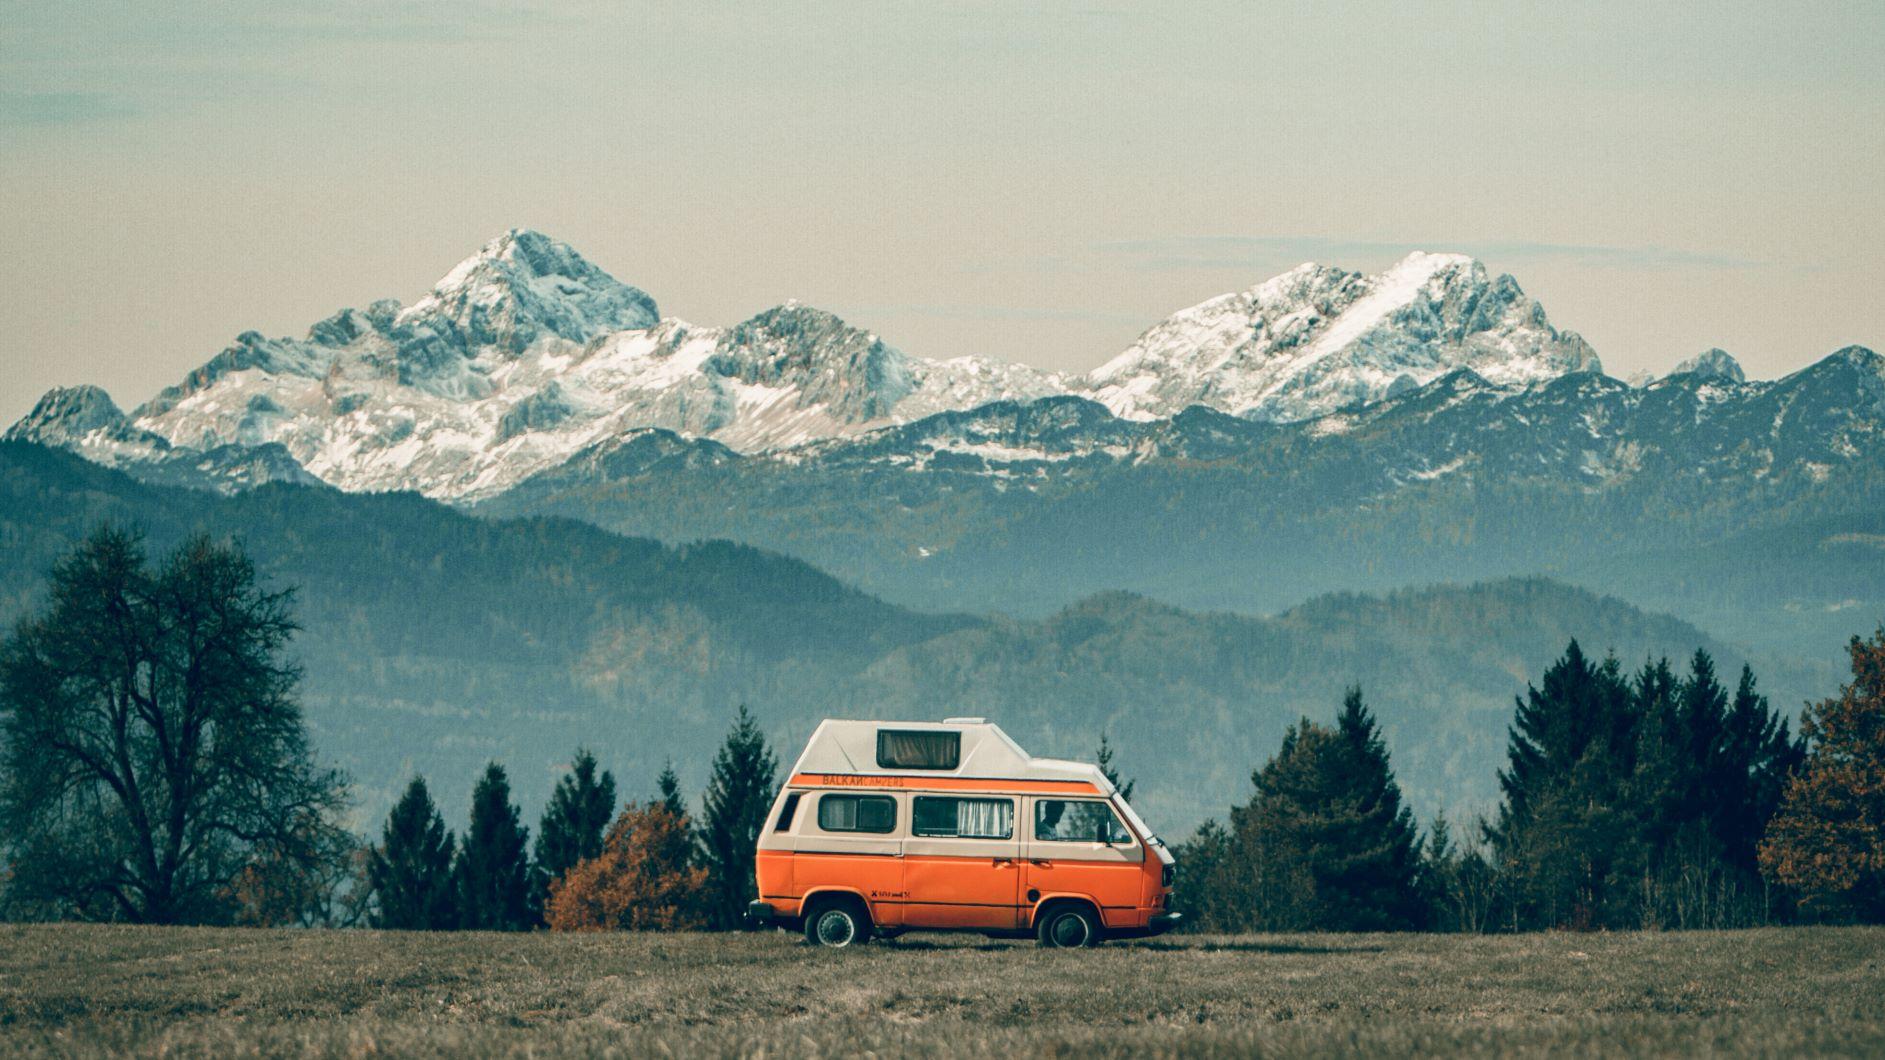 Vintage road trip adventure!